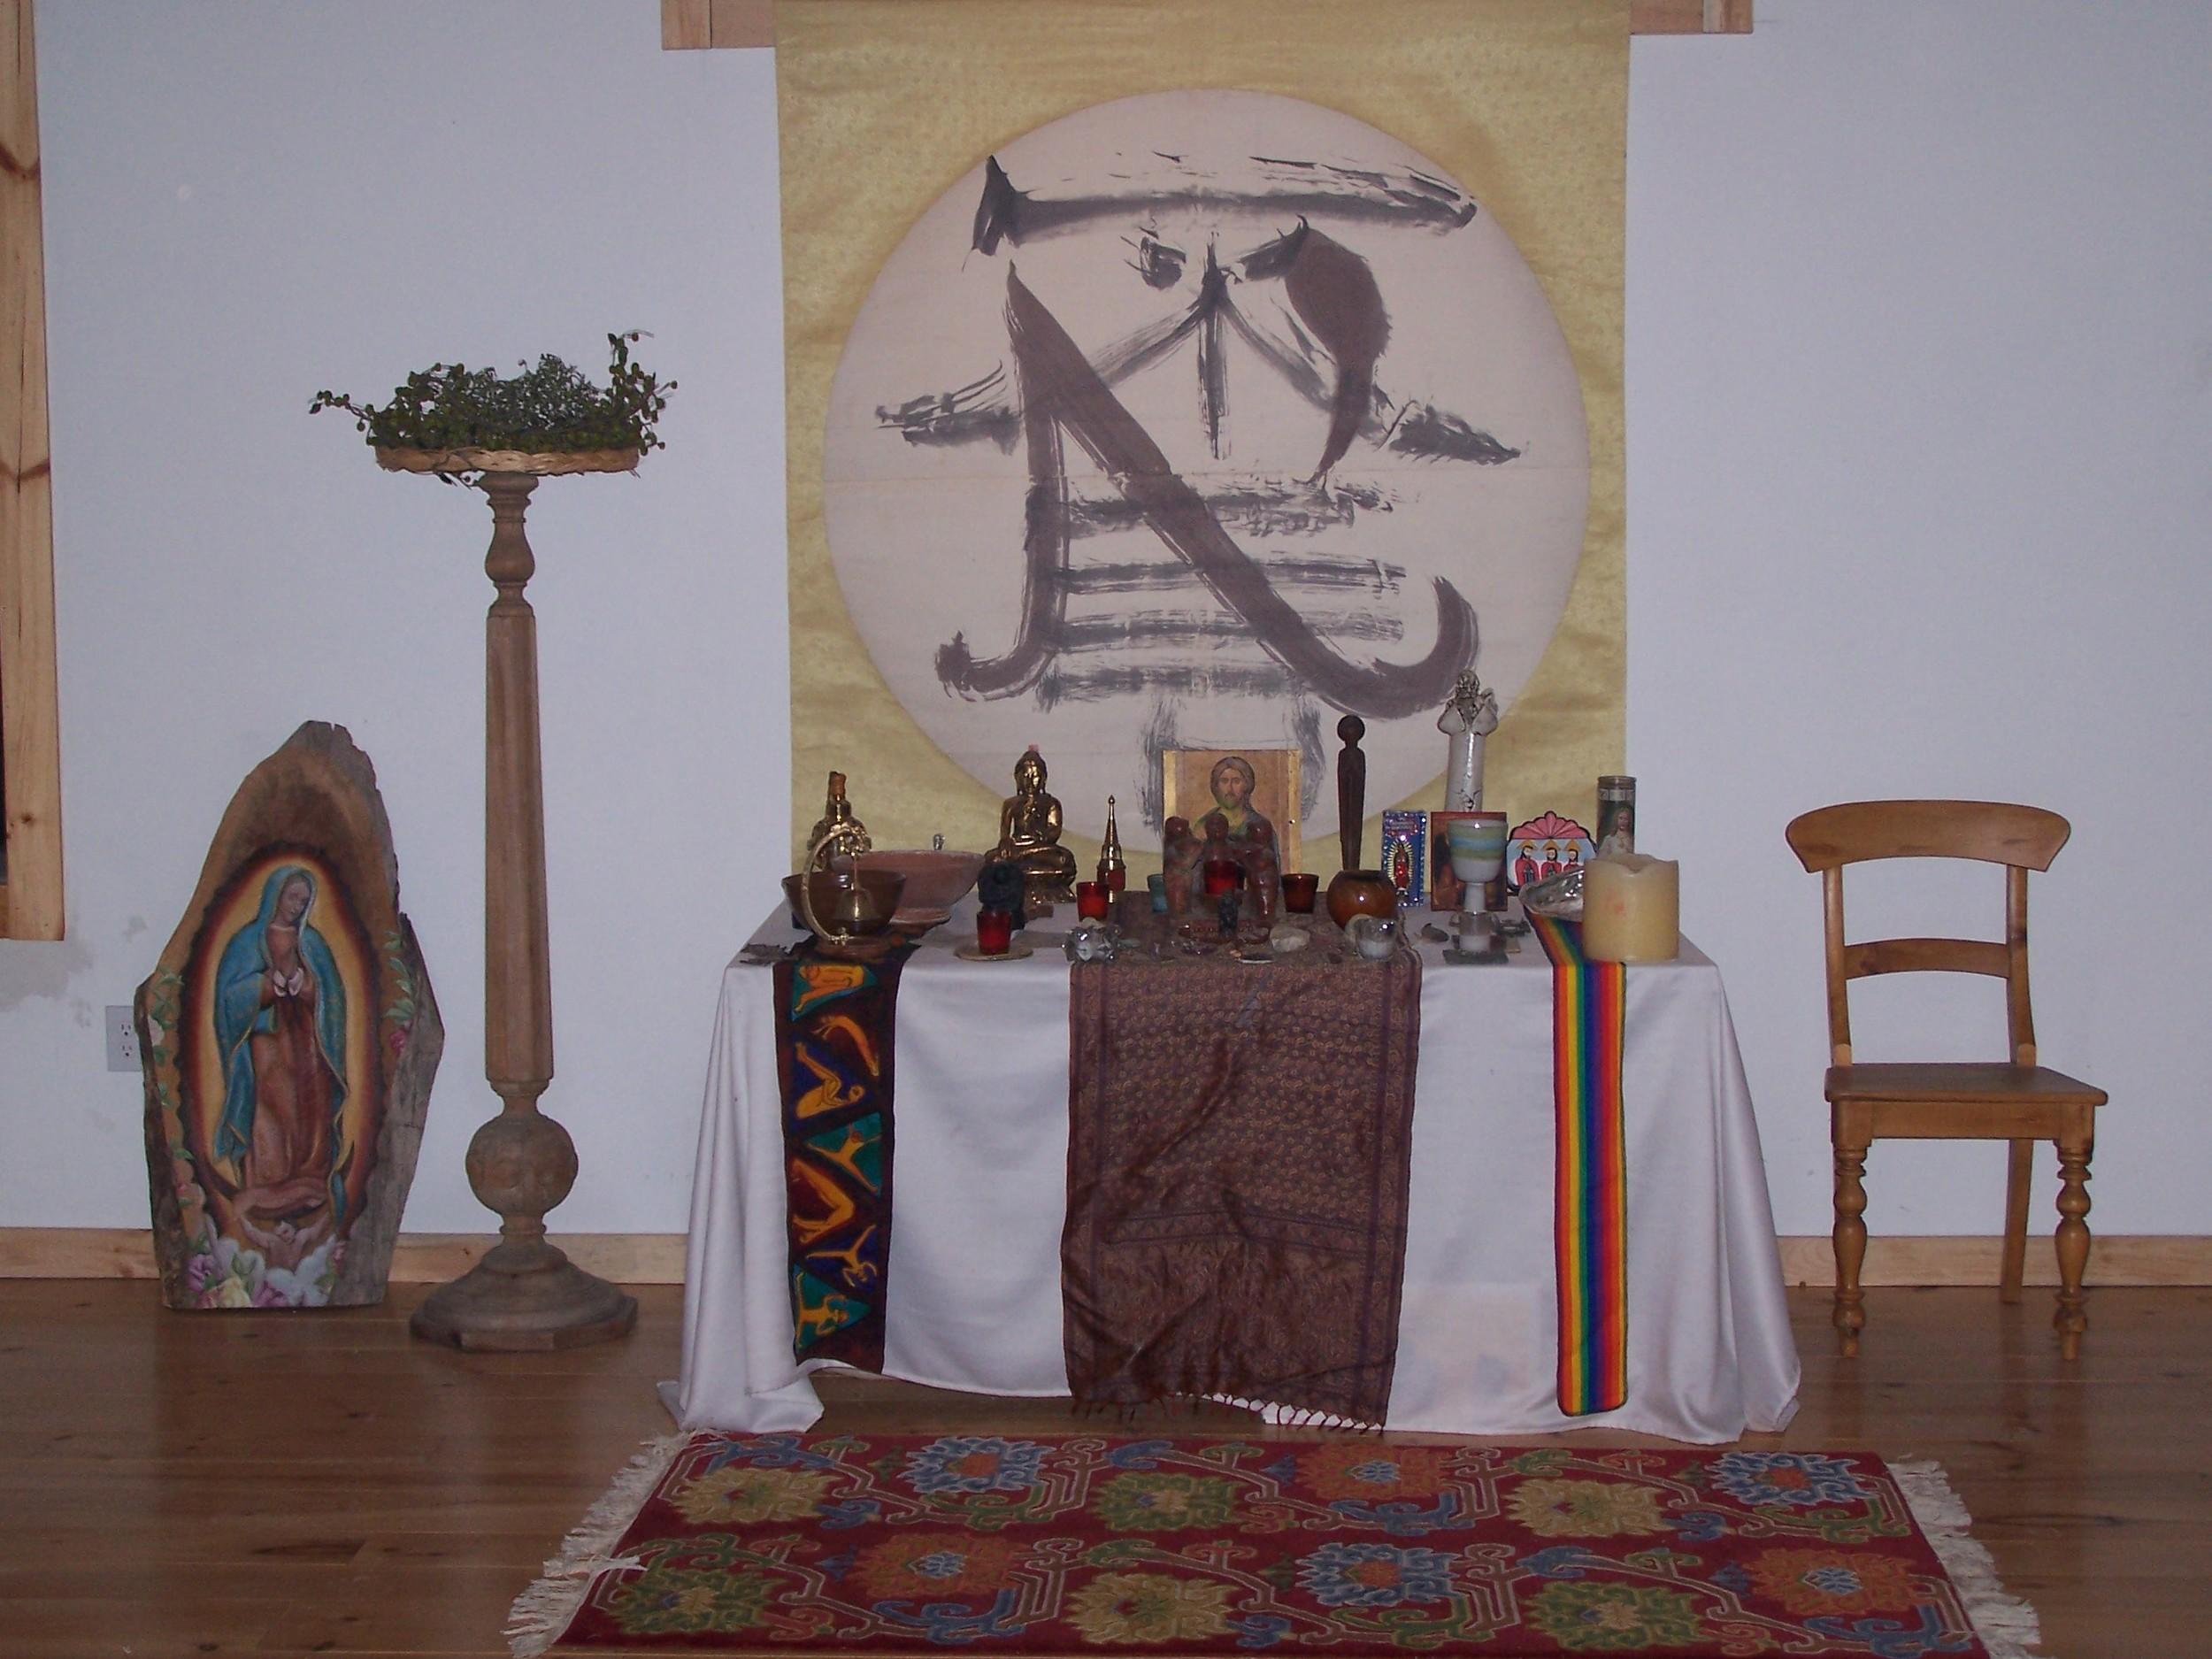 A;tar in 2005